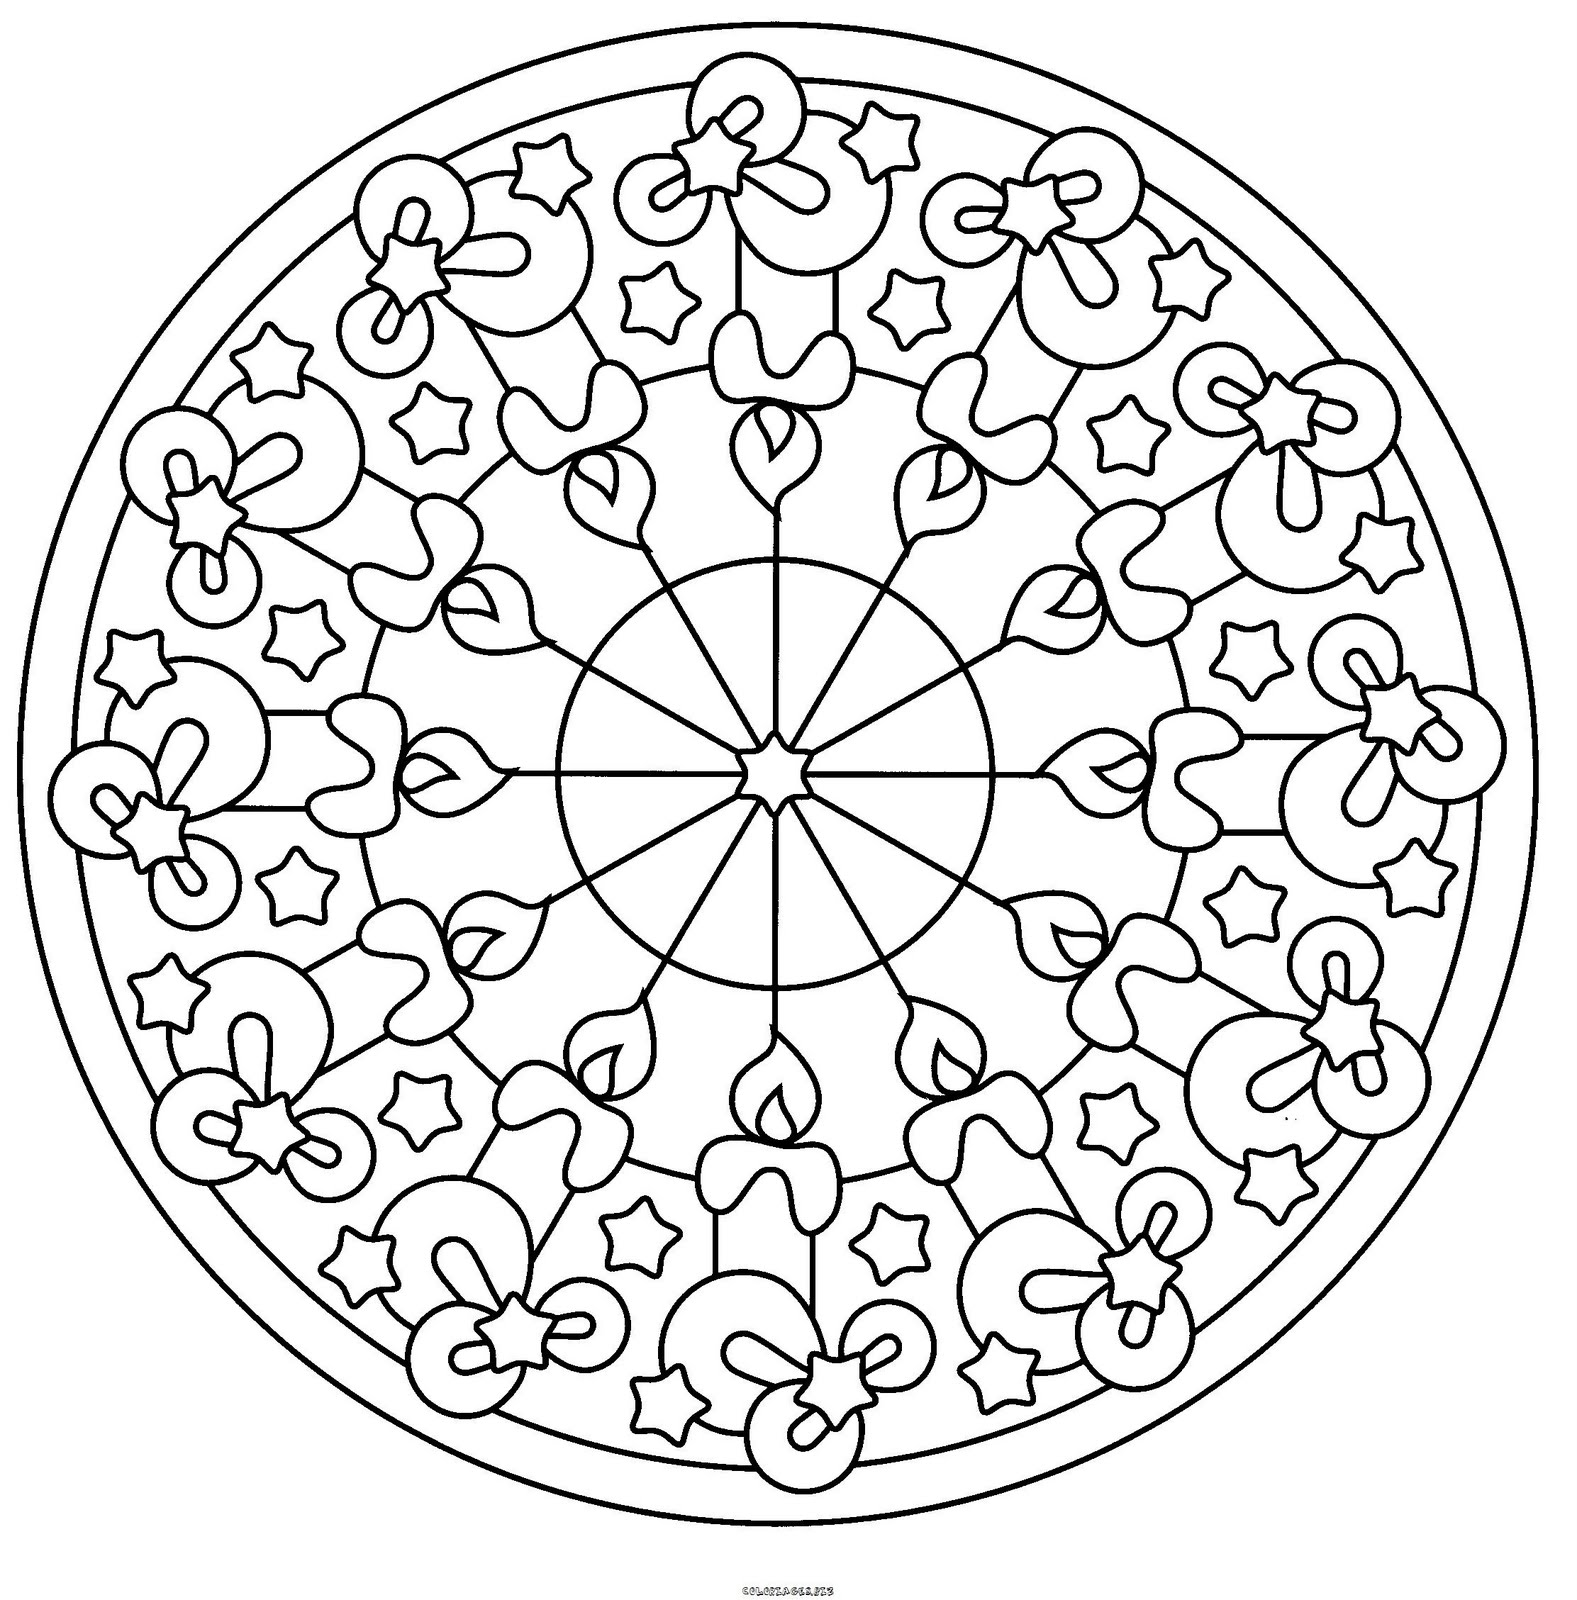 Malvorlagen Mandala Blumen - Malvorlagen Mandalas - JetztMalen de